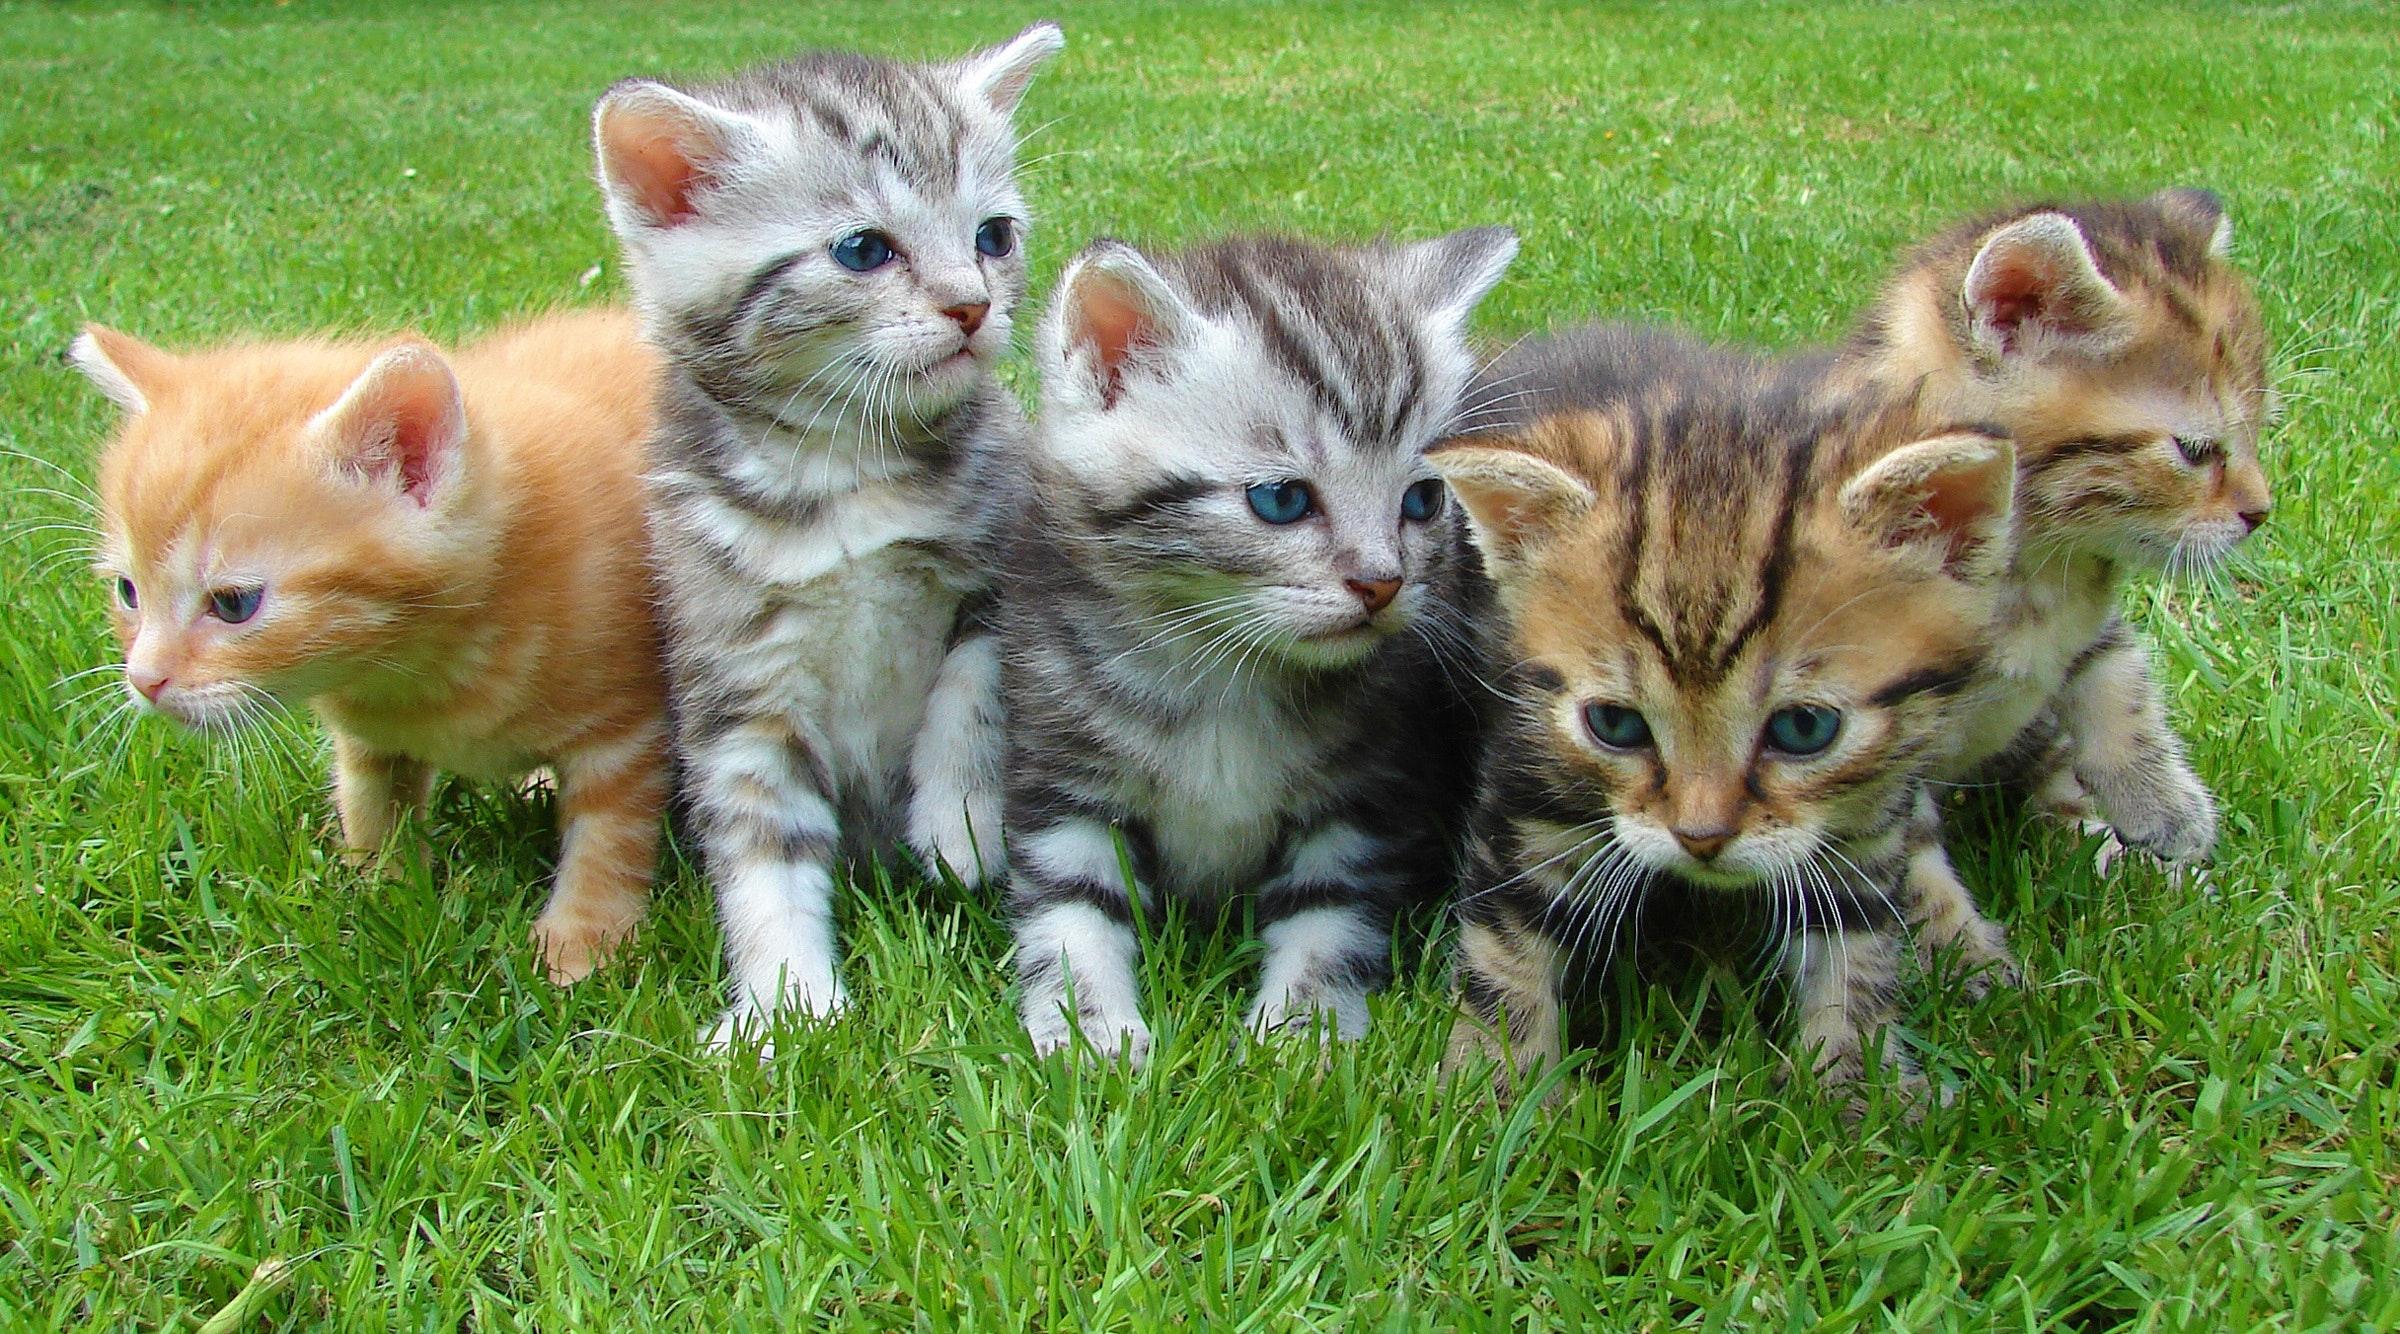 Cat Friendly Lawn Care